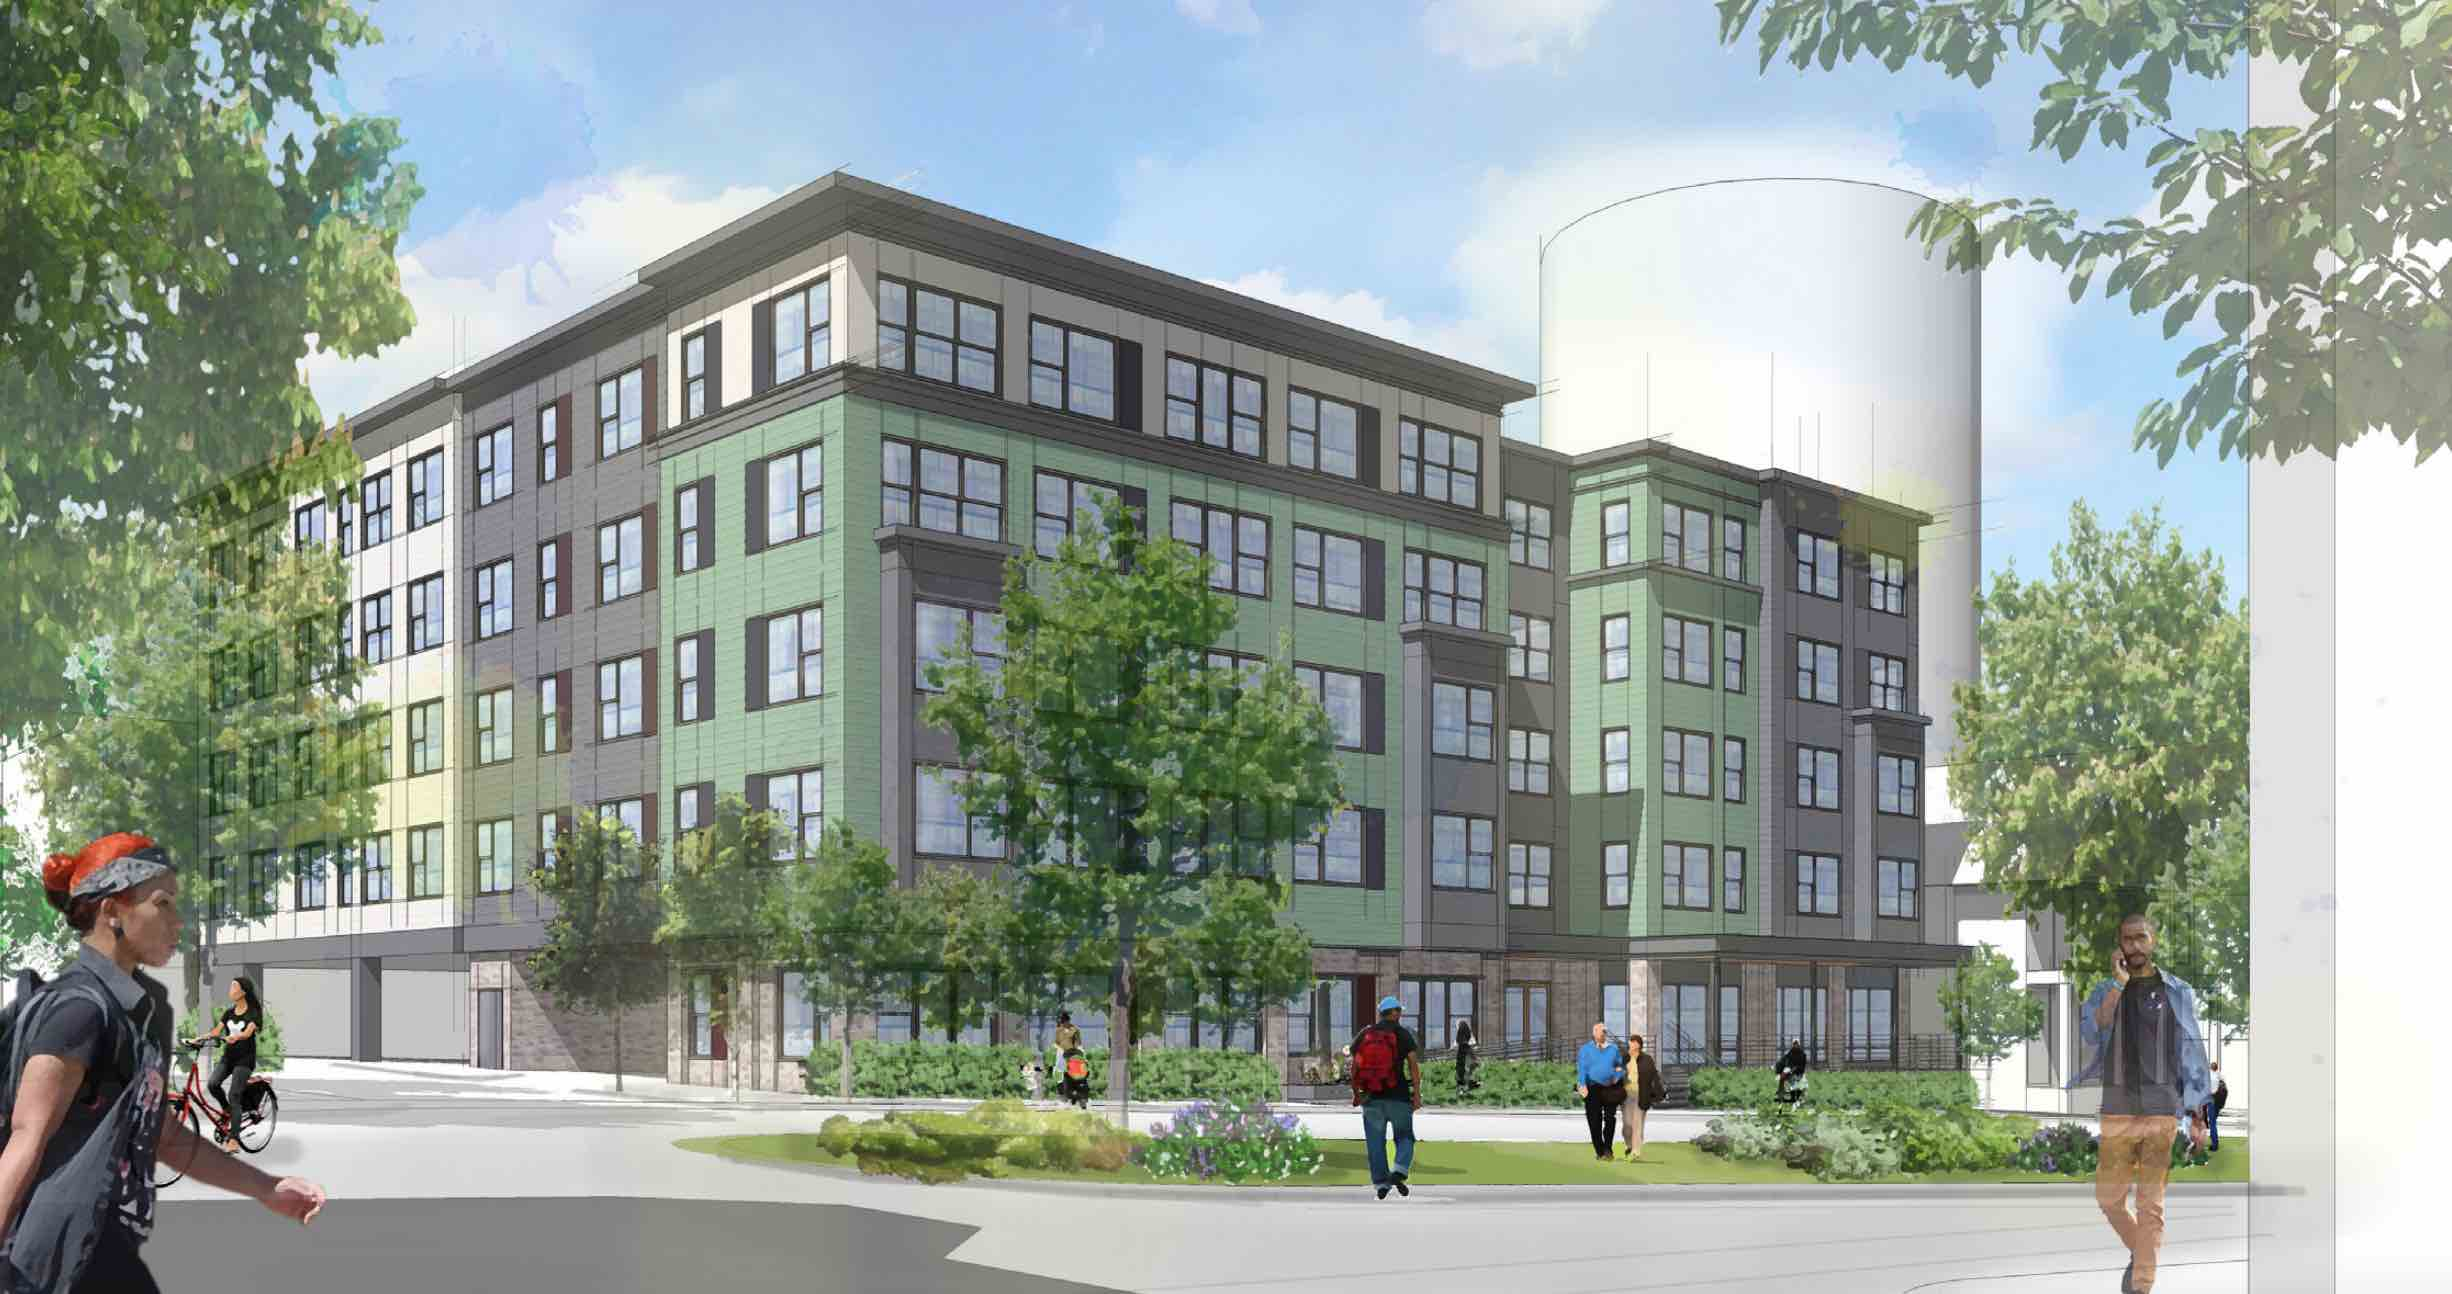 Great 41 51 Walnut Park Roxbury Boston Affordable Apartments Urban Edge Dream  Collaborative ...